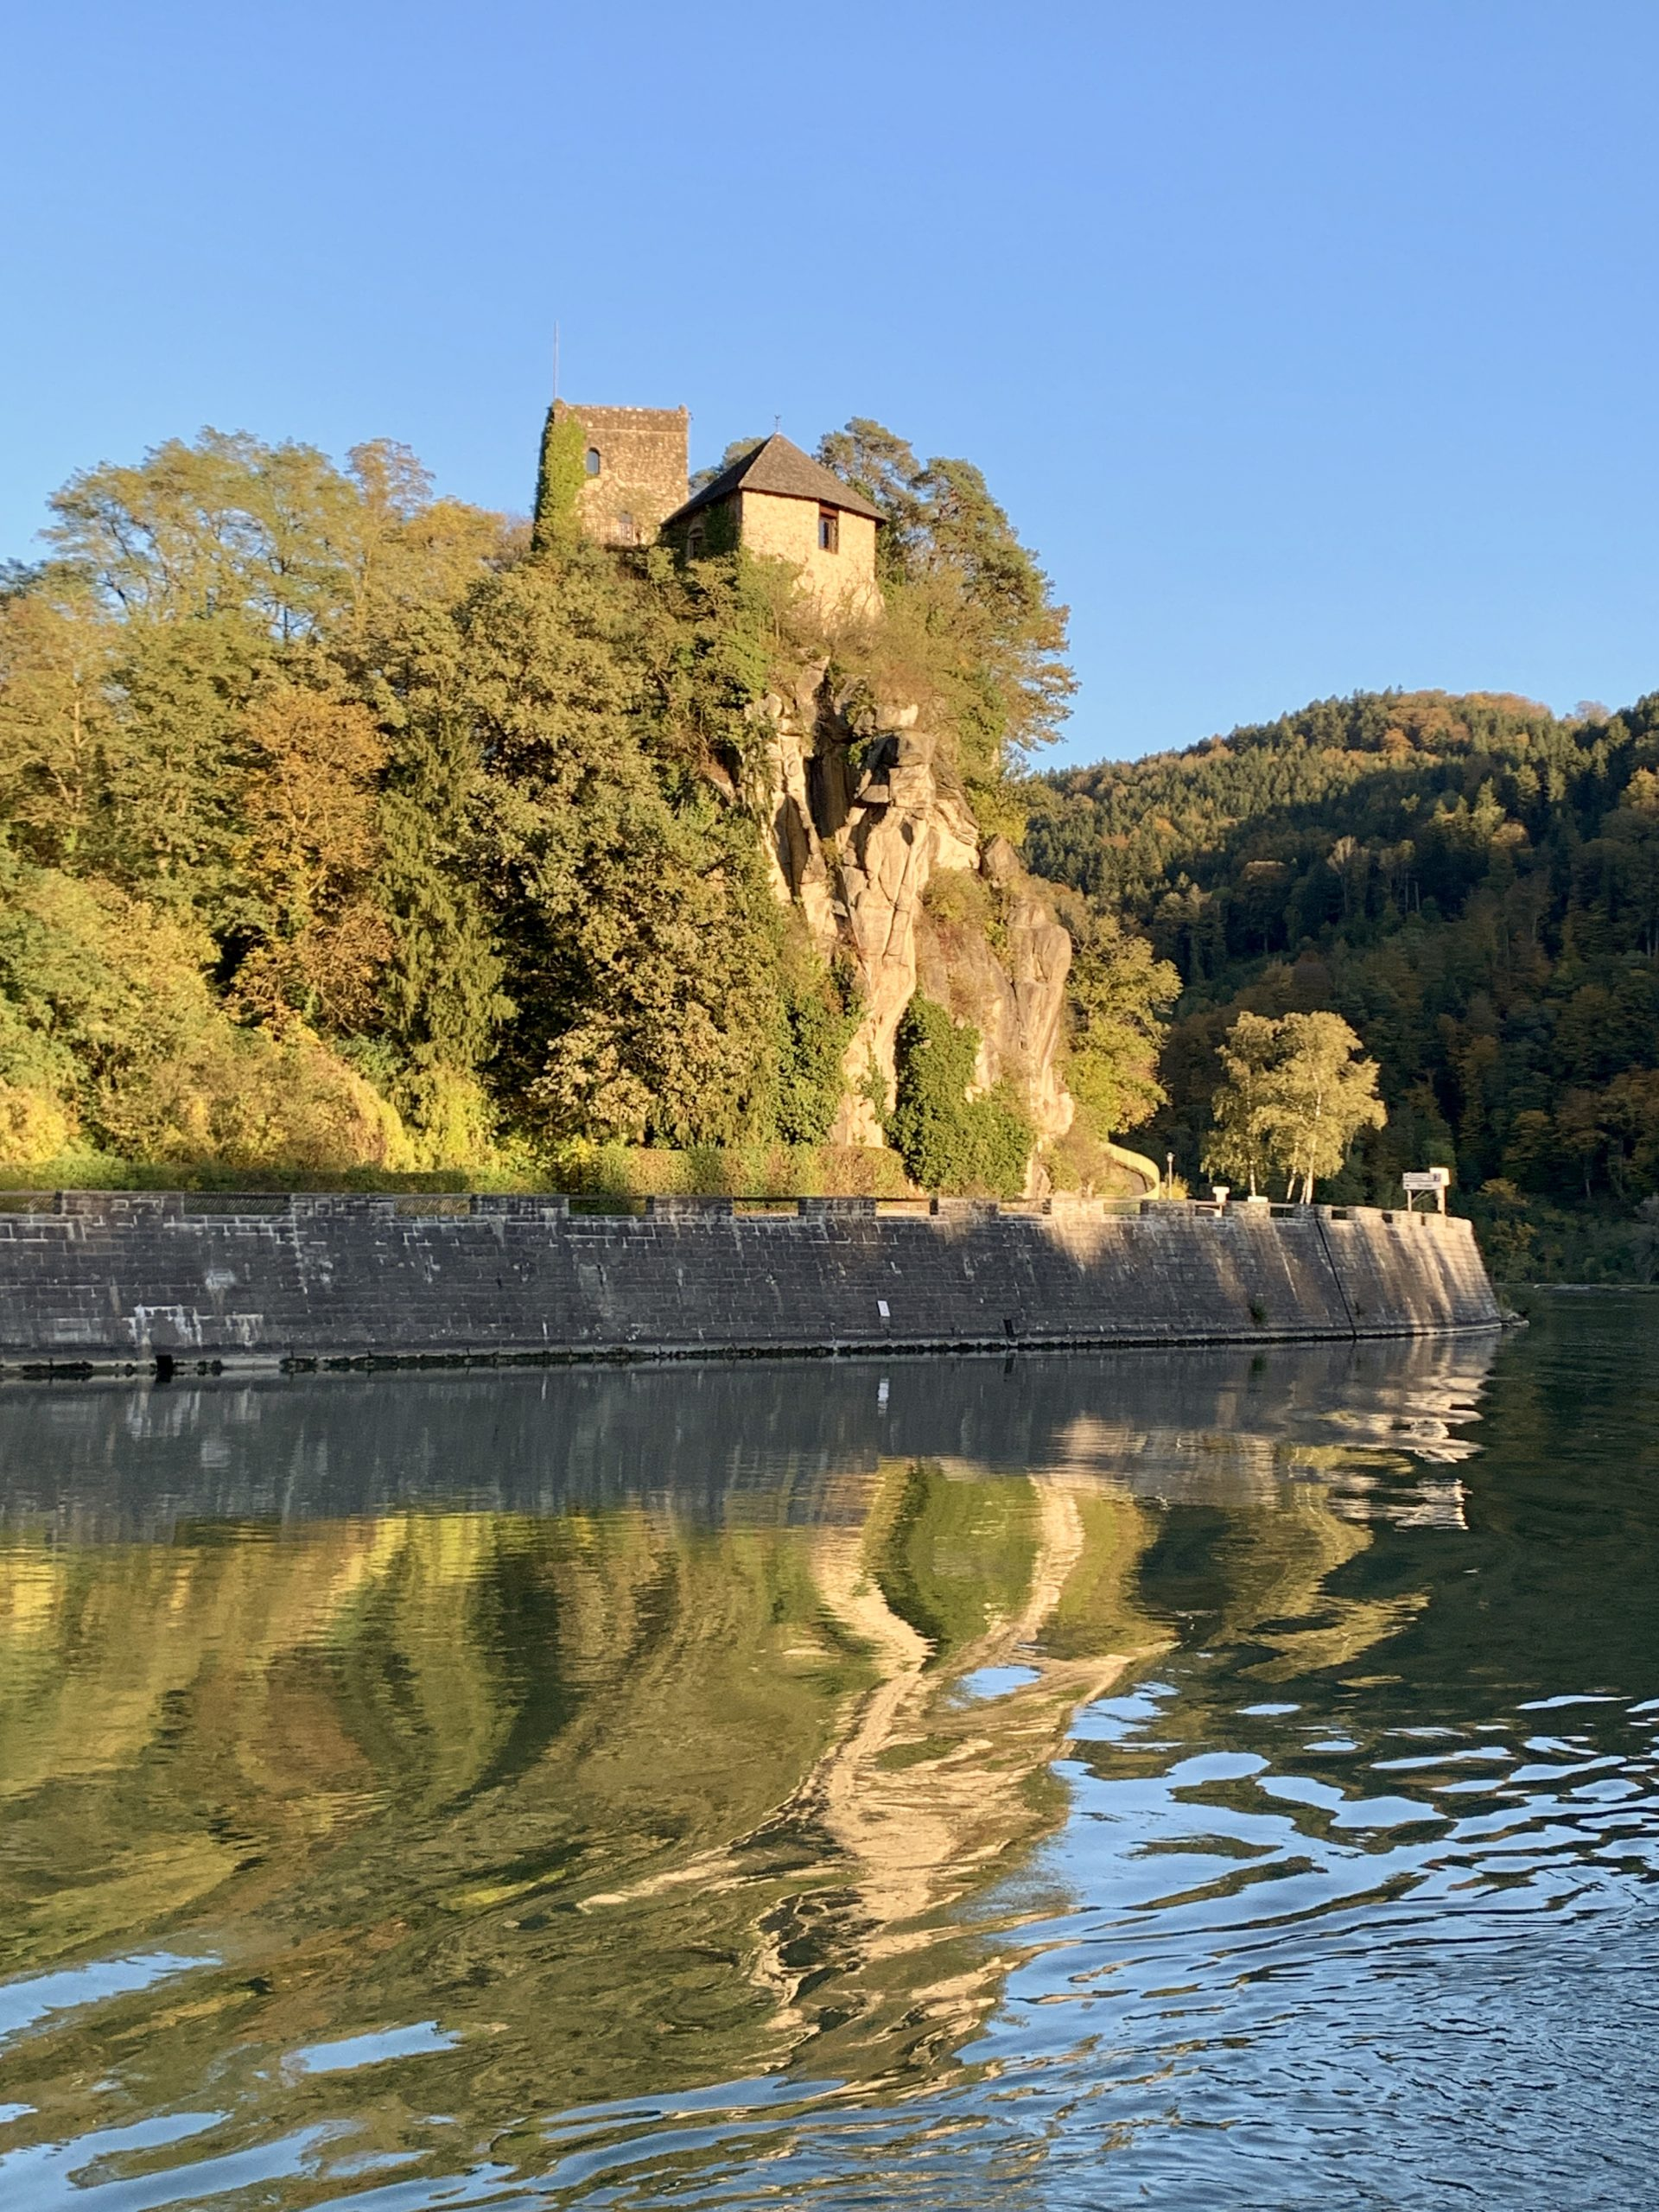 views on the Danube